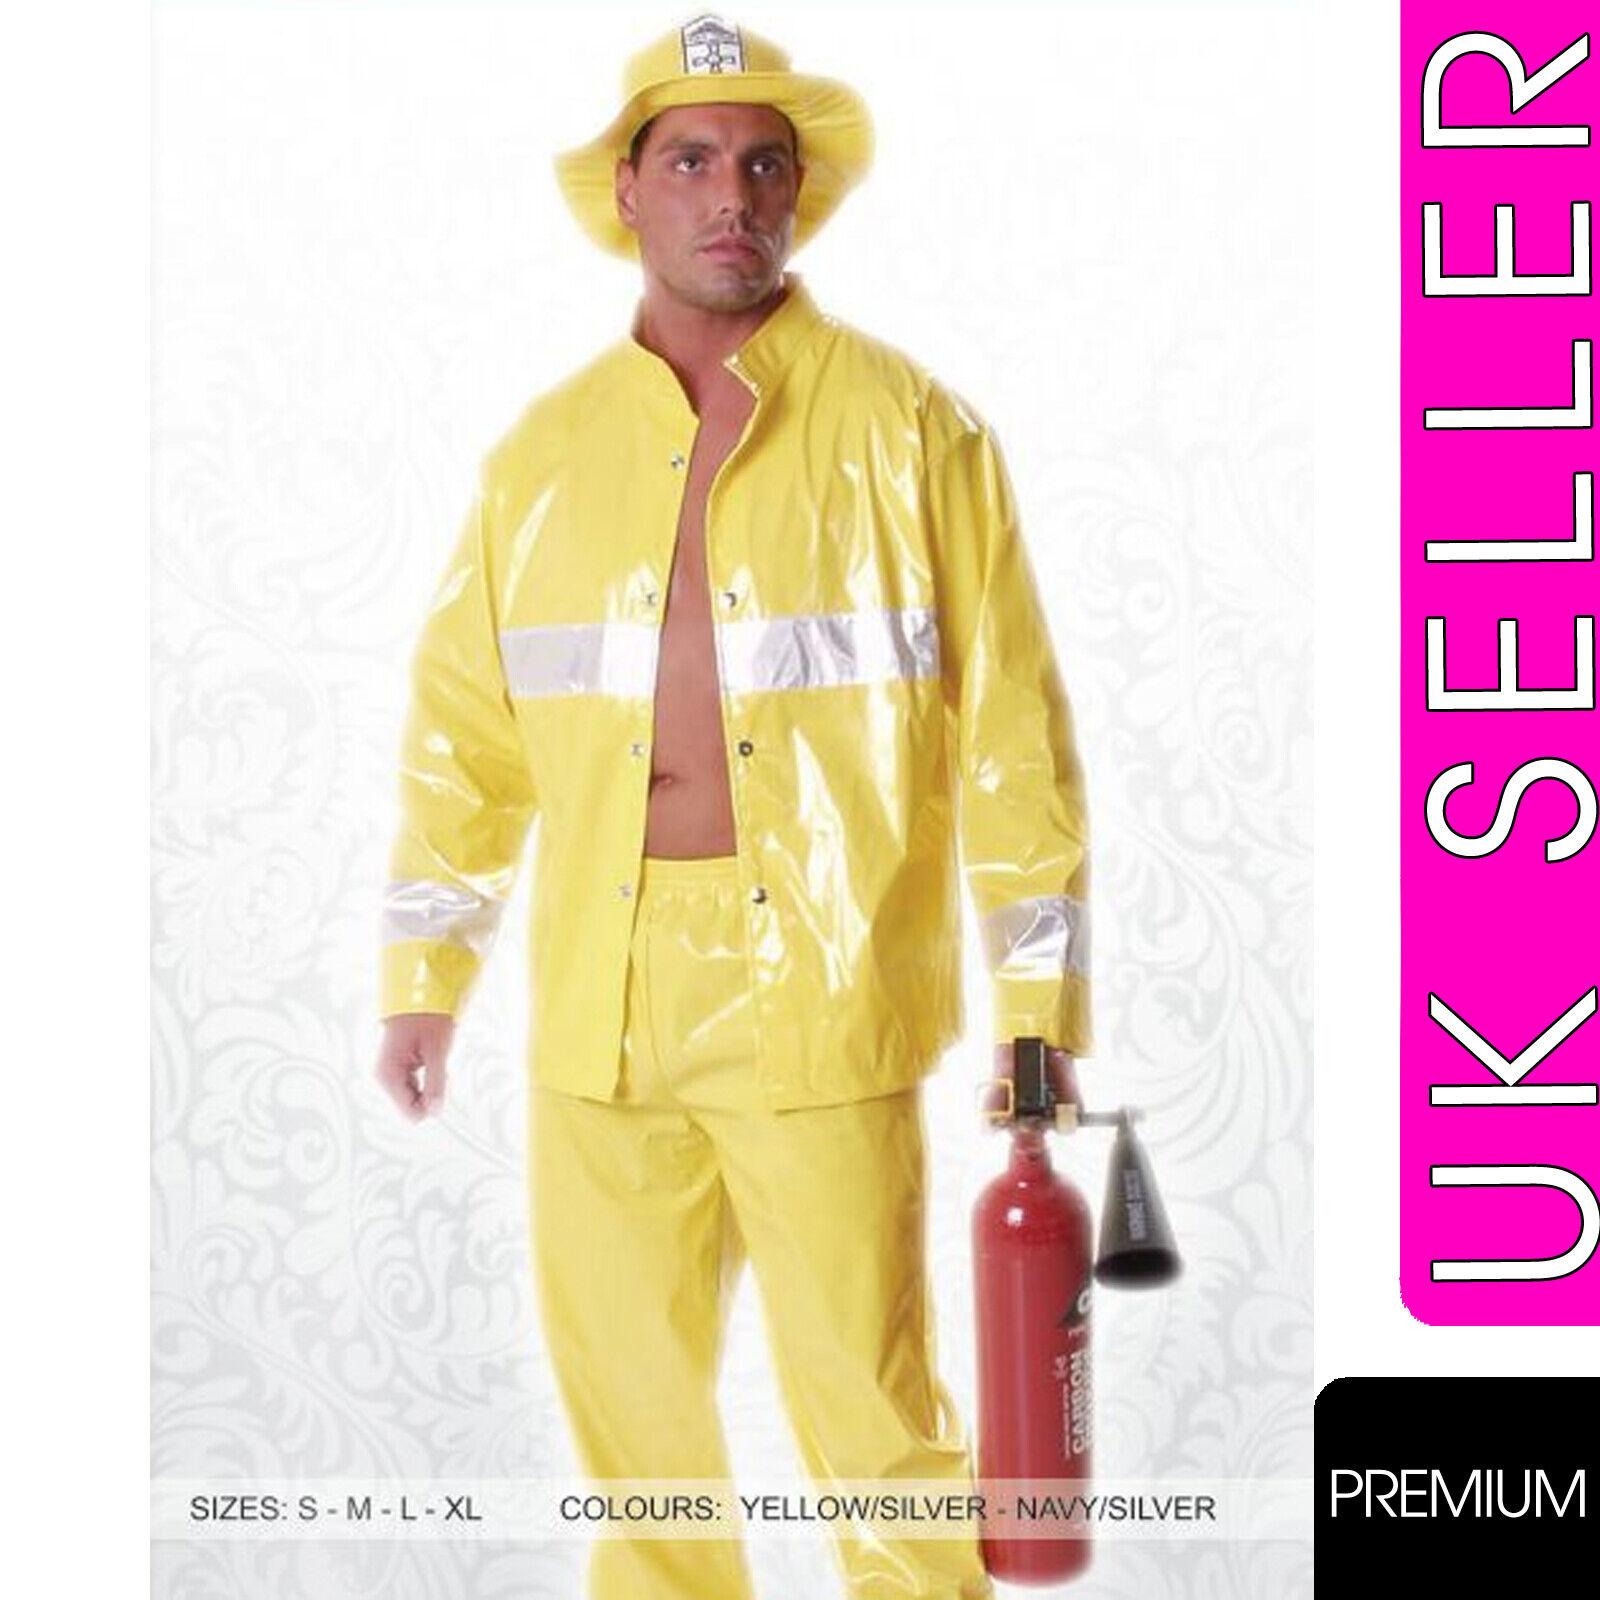 Mens Fireman Fancy Dress Costume Firefigher Fire Fighter Uniform Great for Stags